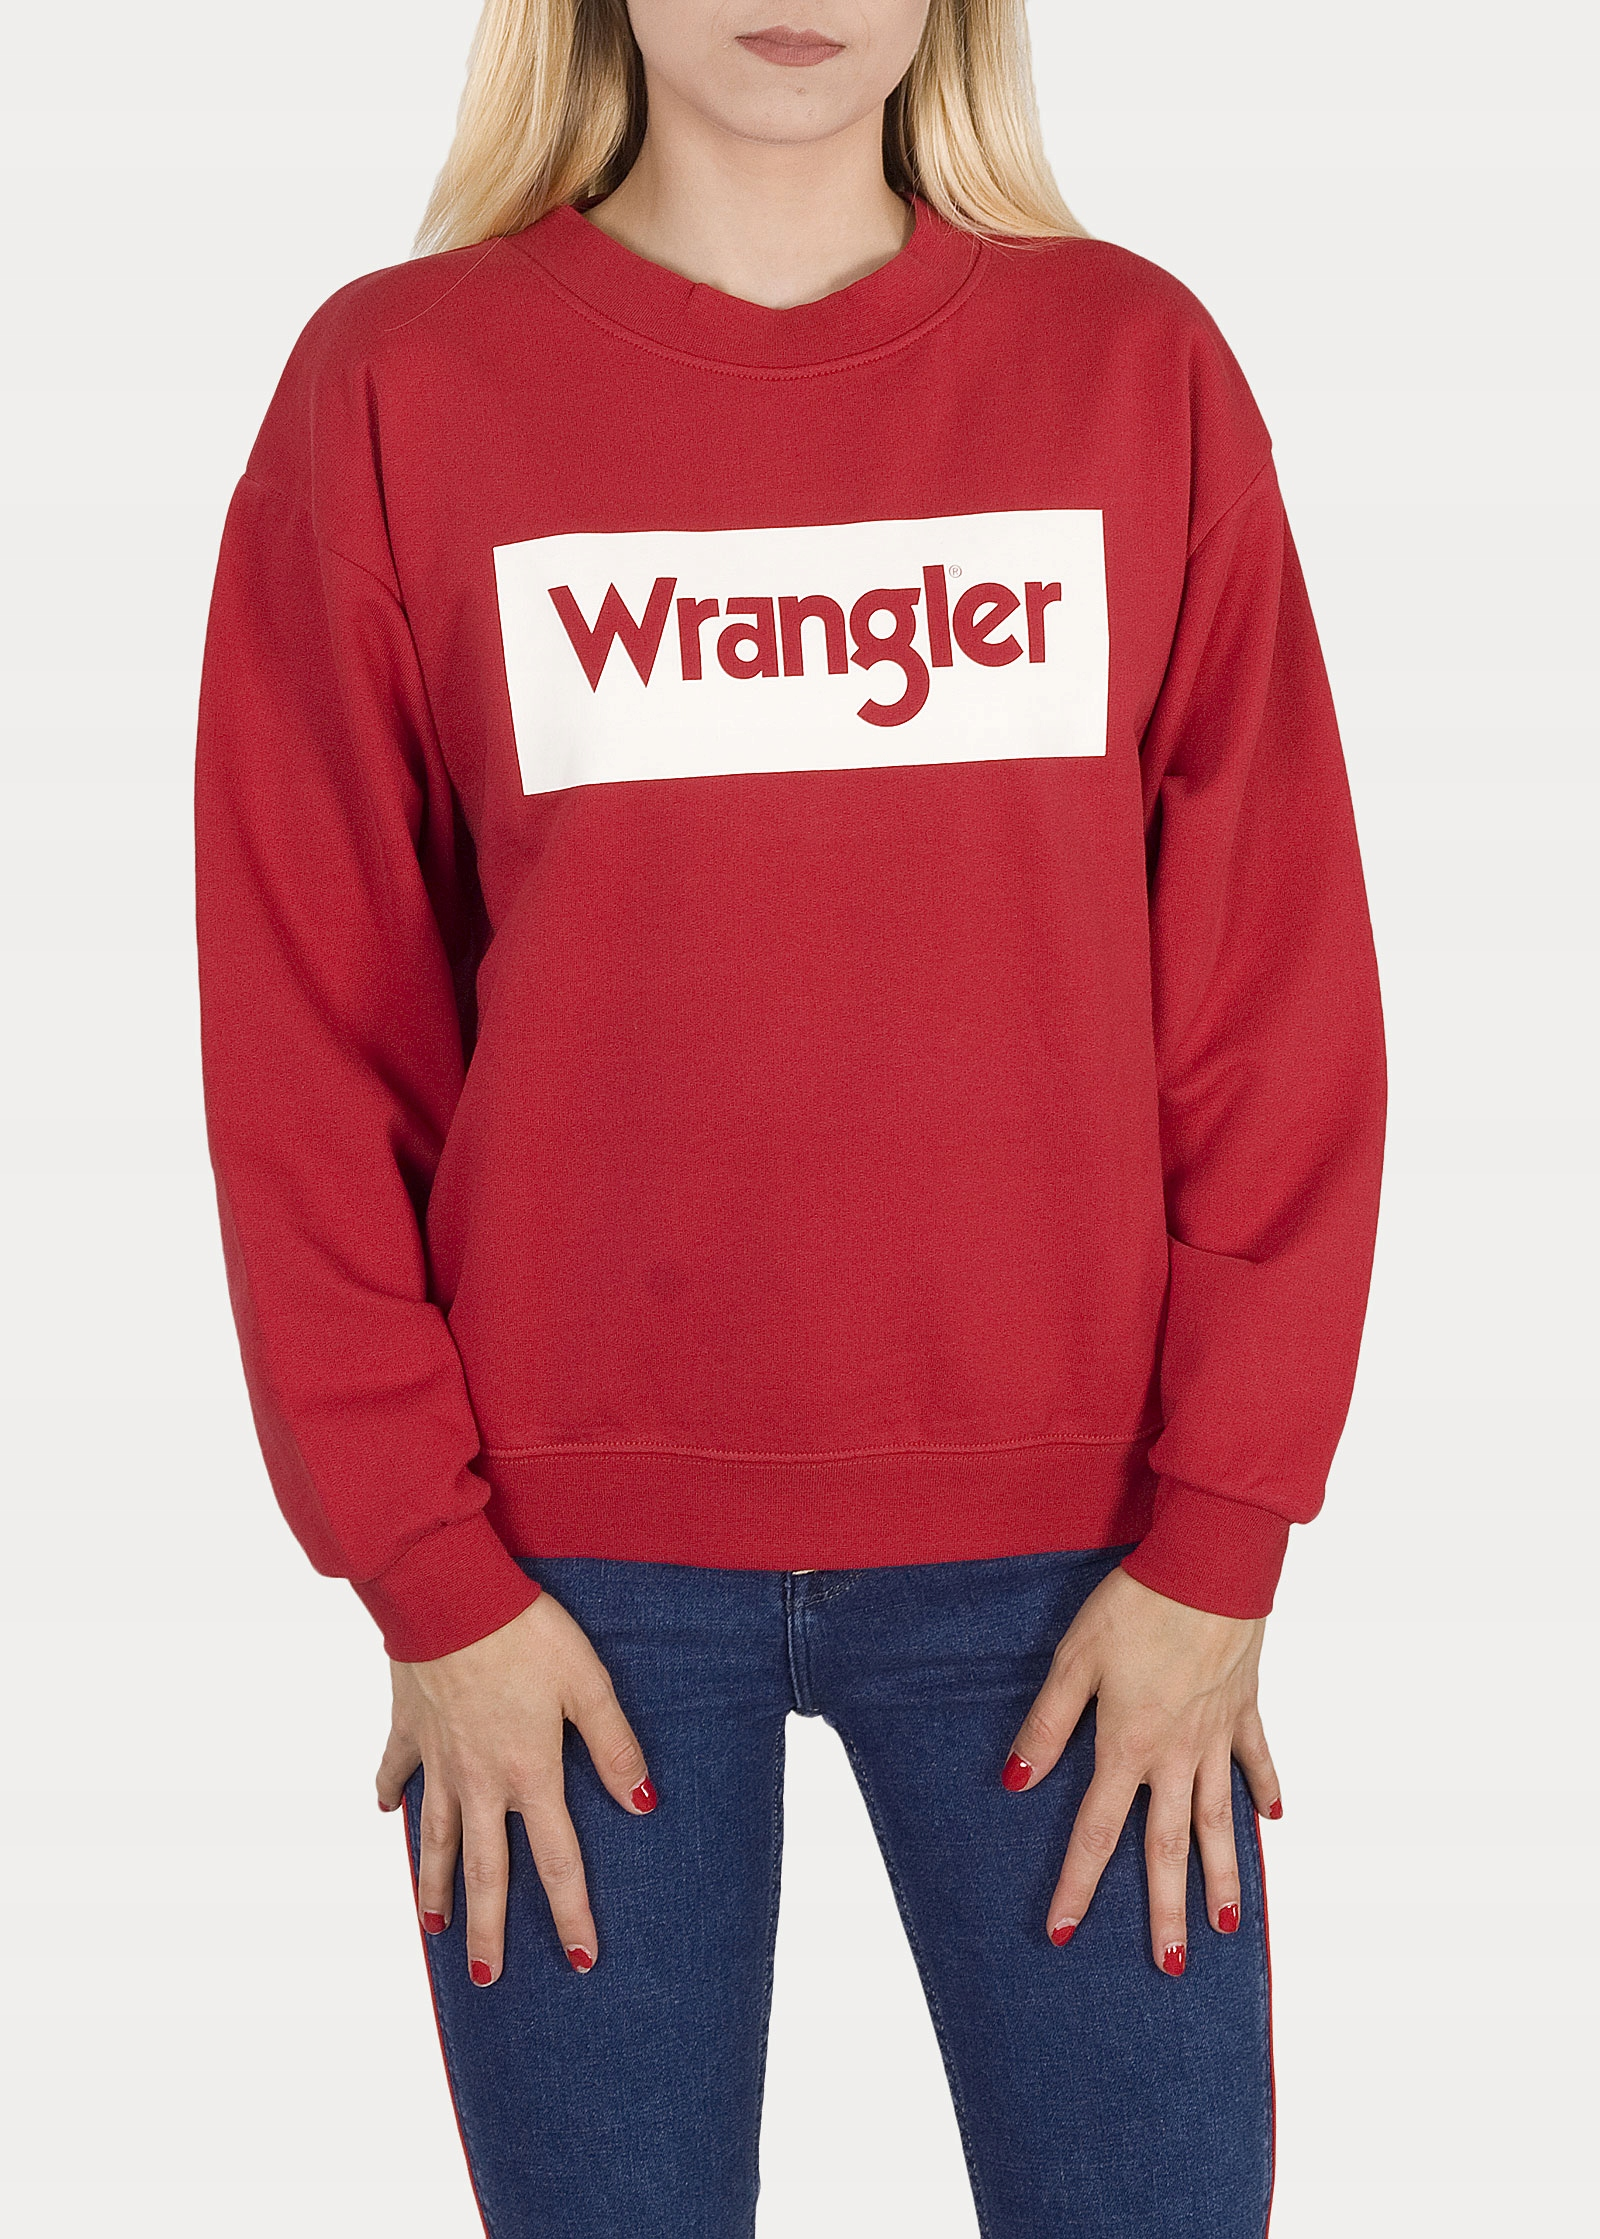 Retro sveter Wrangler 80´S - červený